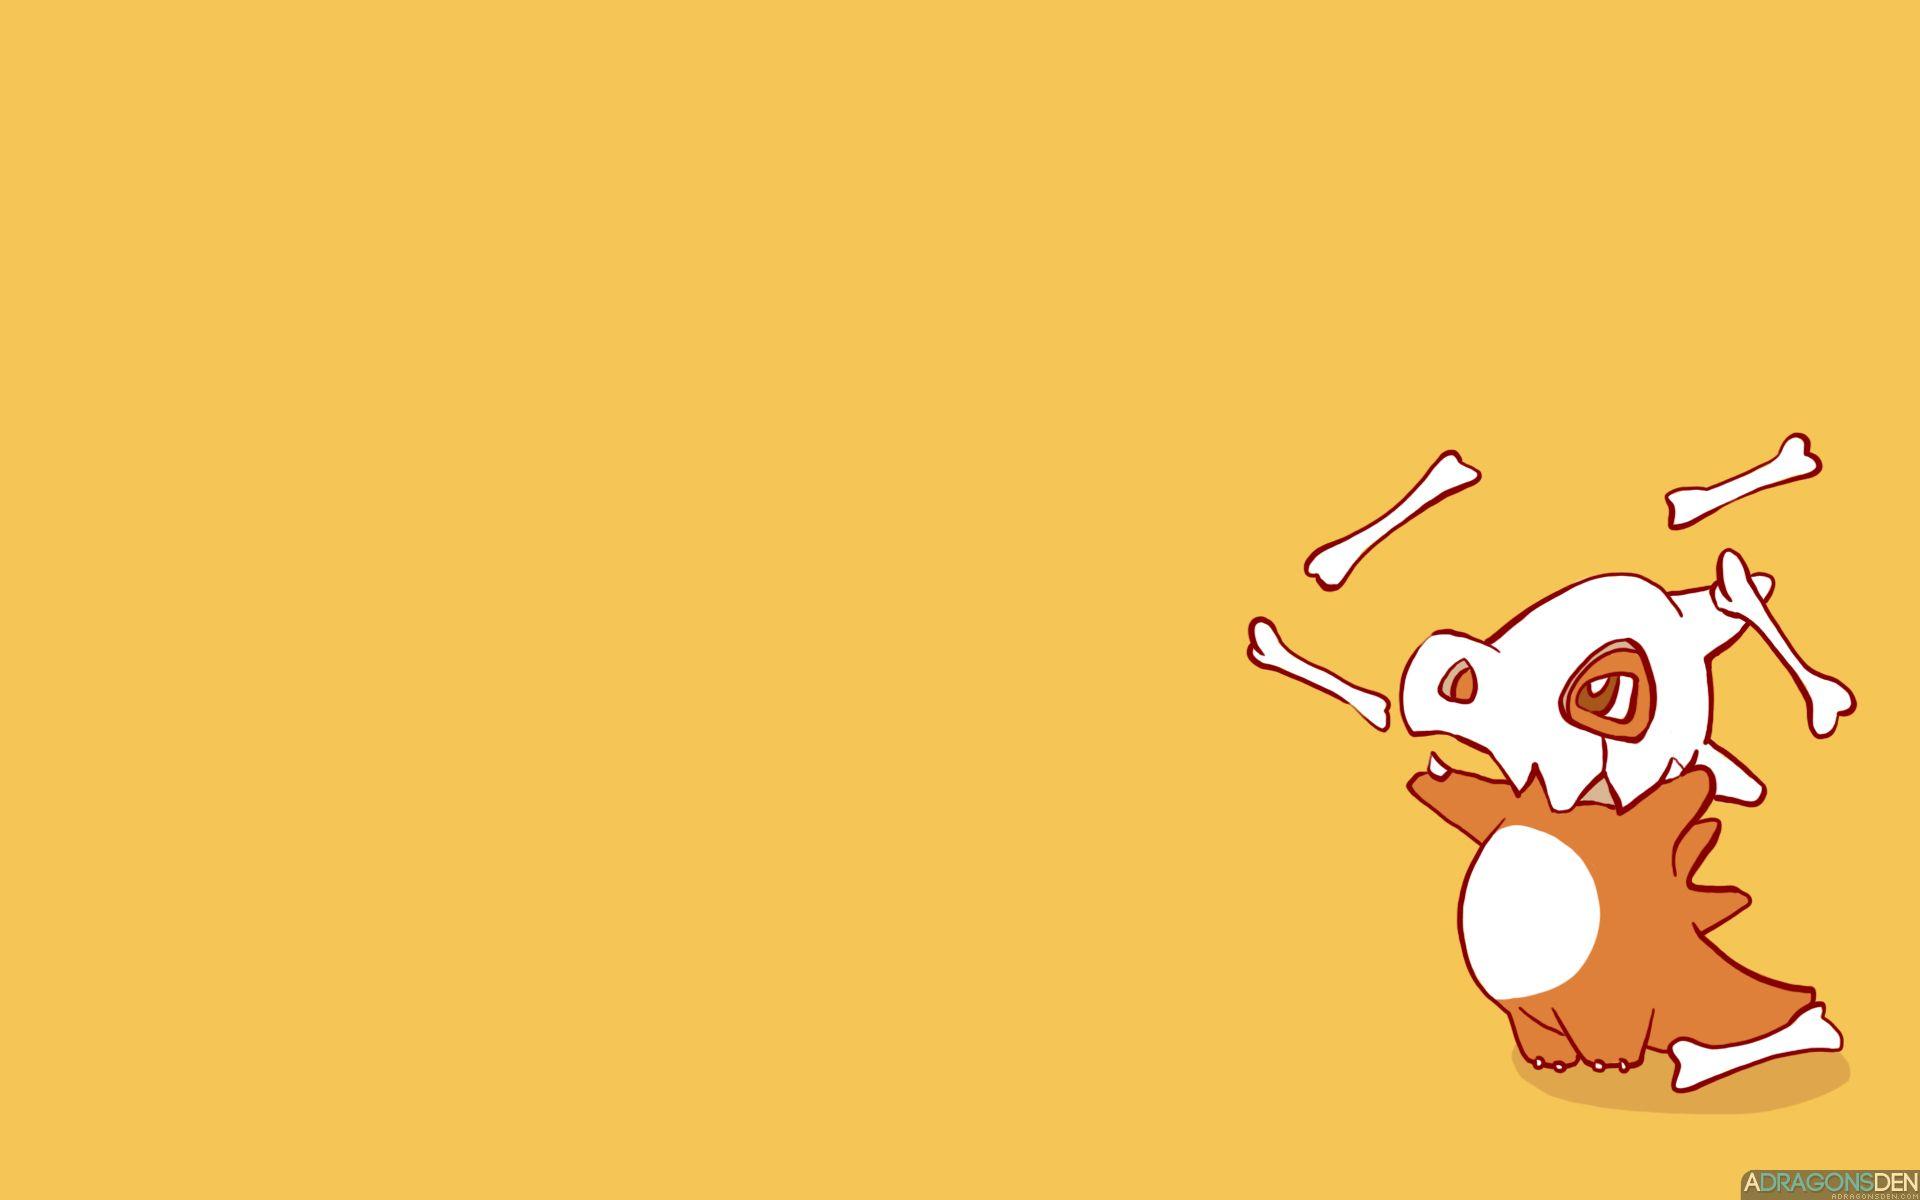 Kawaii Pokemon Wallpaper En 2020 Fondo De Pantalla De Nubes Imagenes De Pikachu Fondos De Pantalla Pc